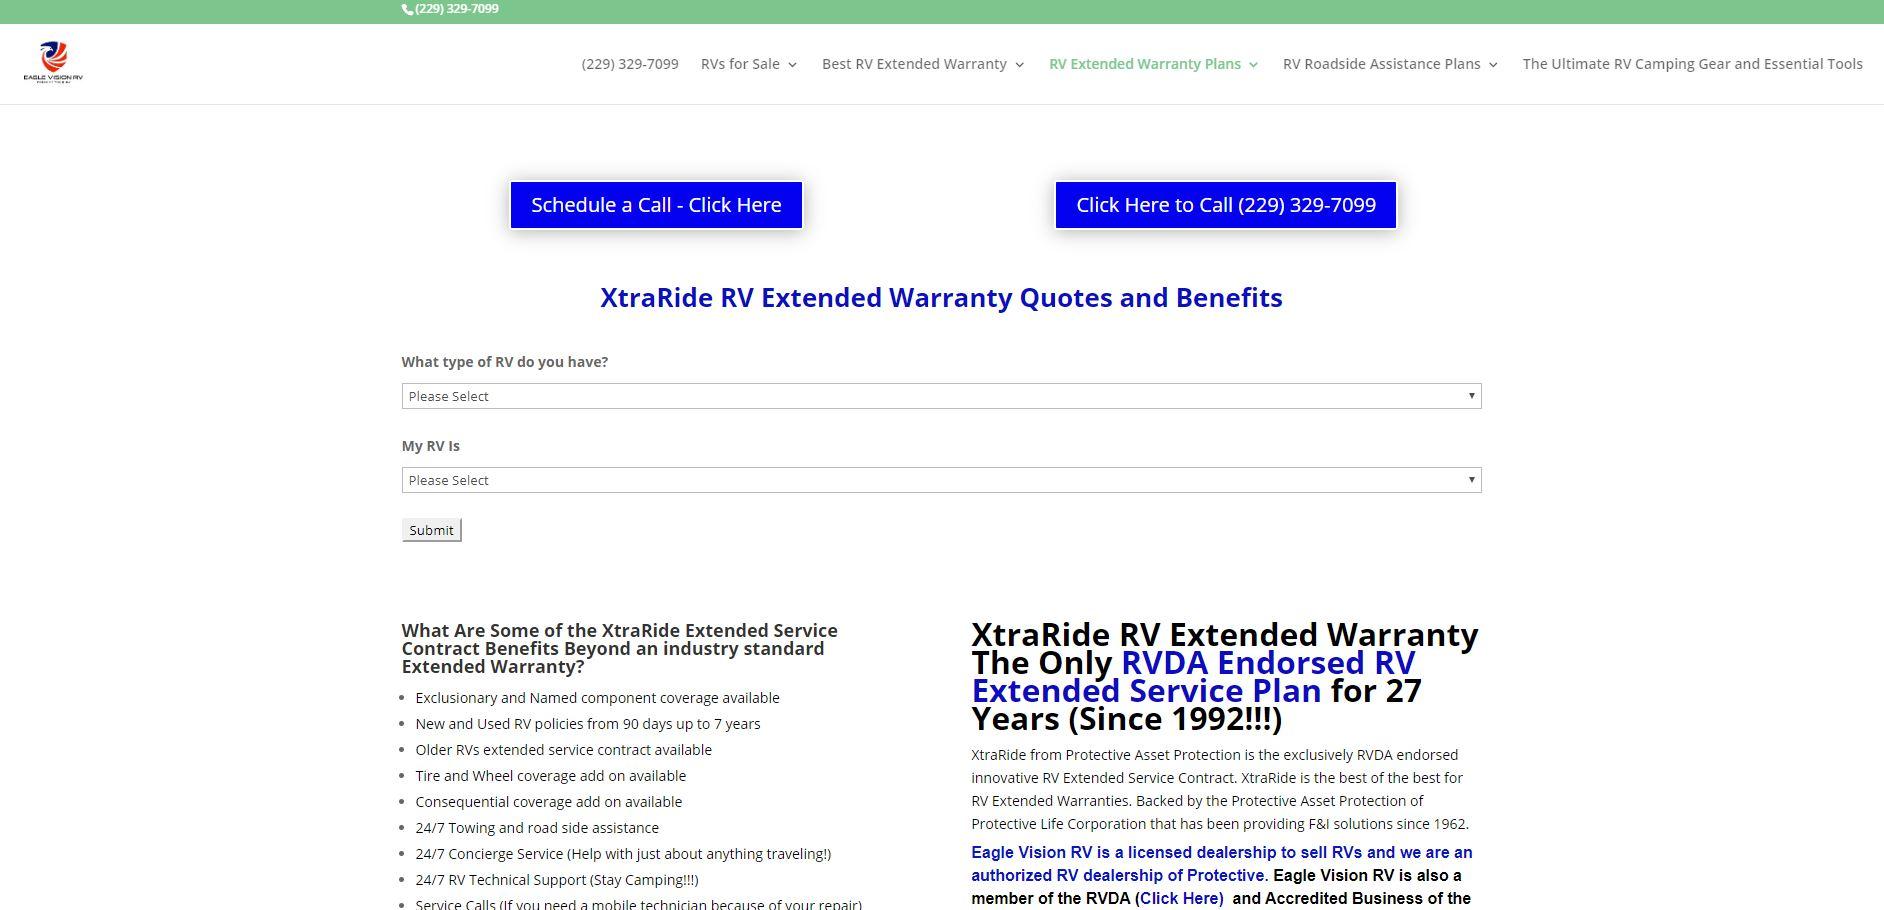 XtraRide RV Extended Warranty